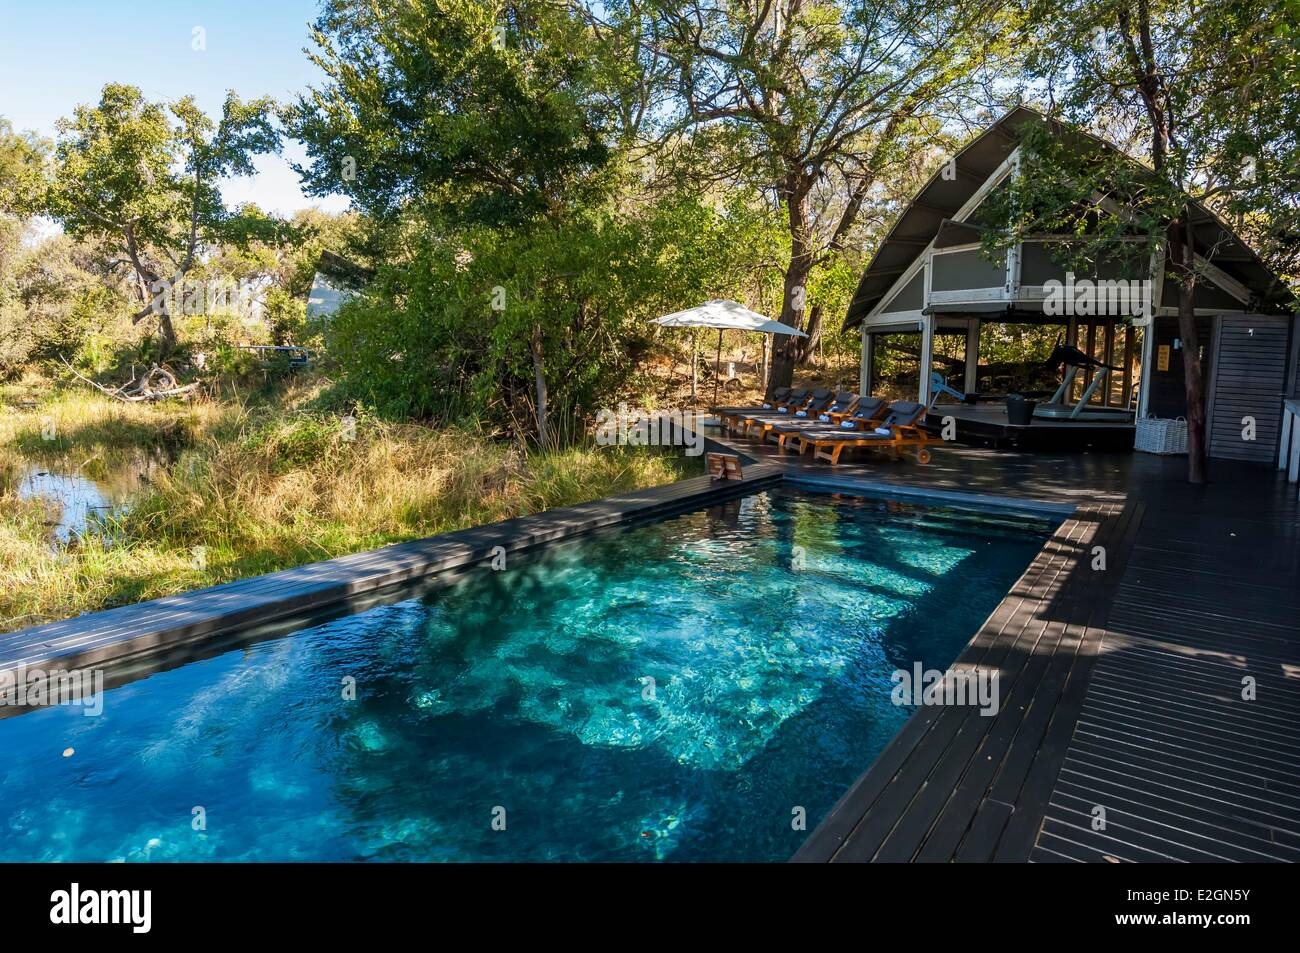 Botswana North West District Okavango Delta Abu Lodge deck and pool - Stock Image